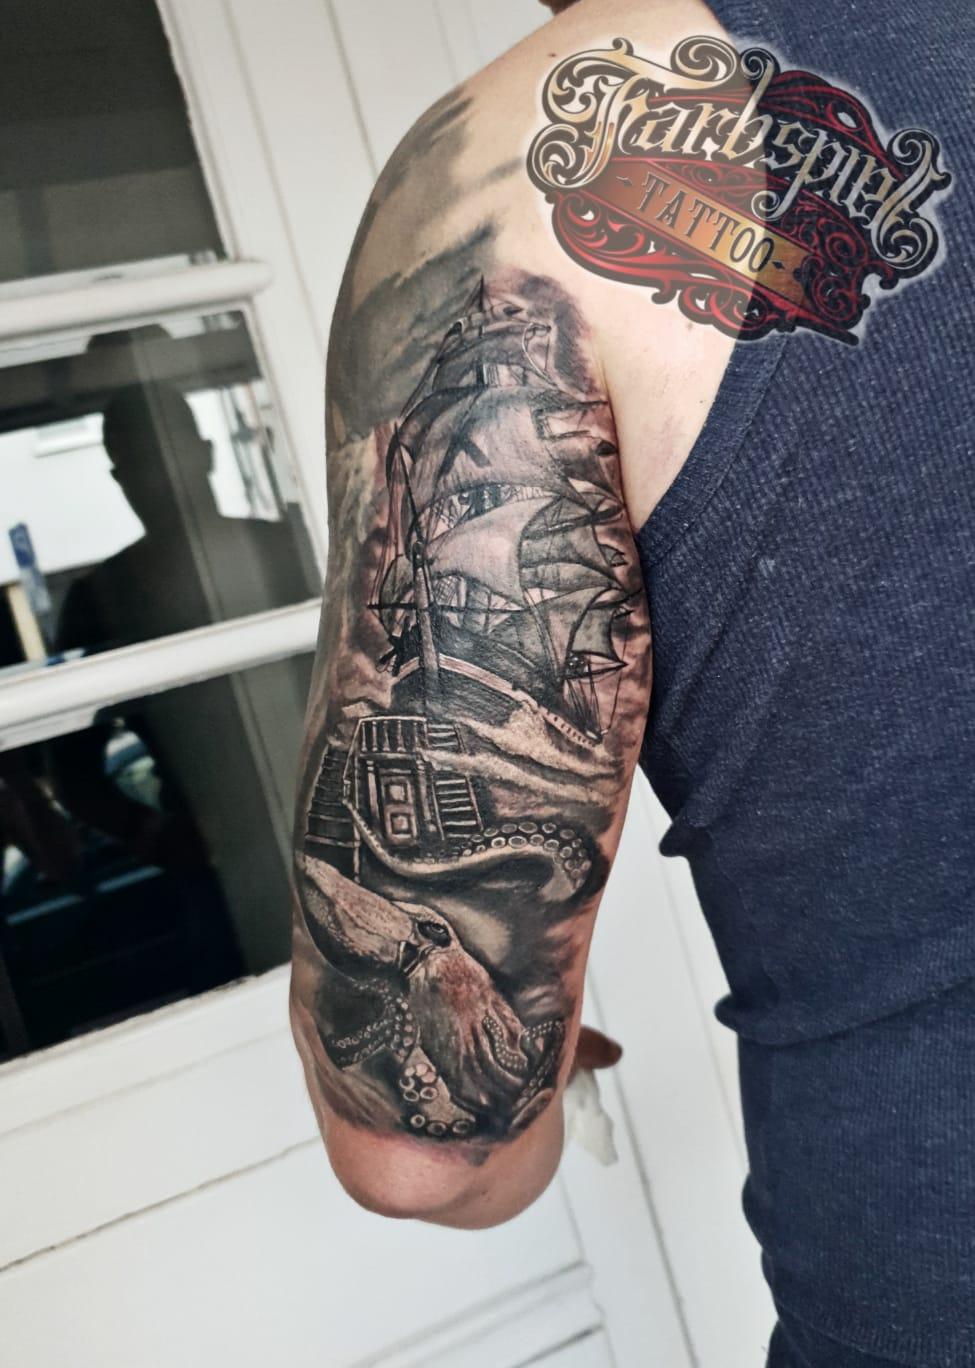 Maritime tattoo